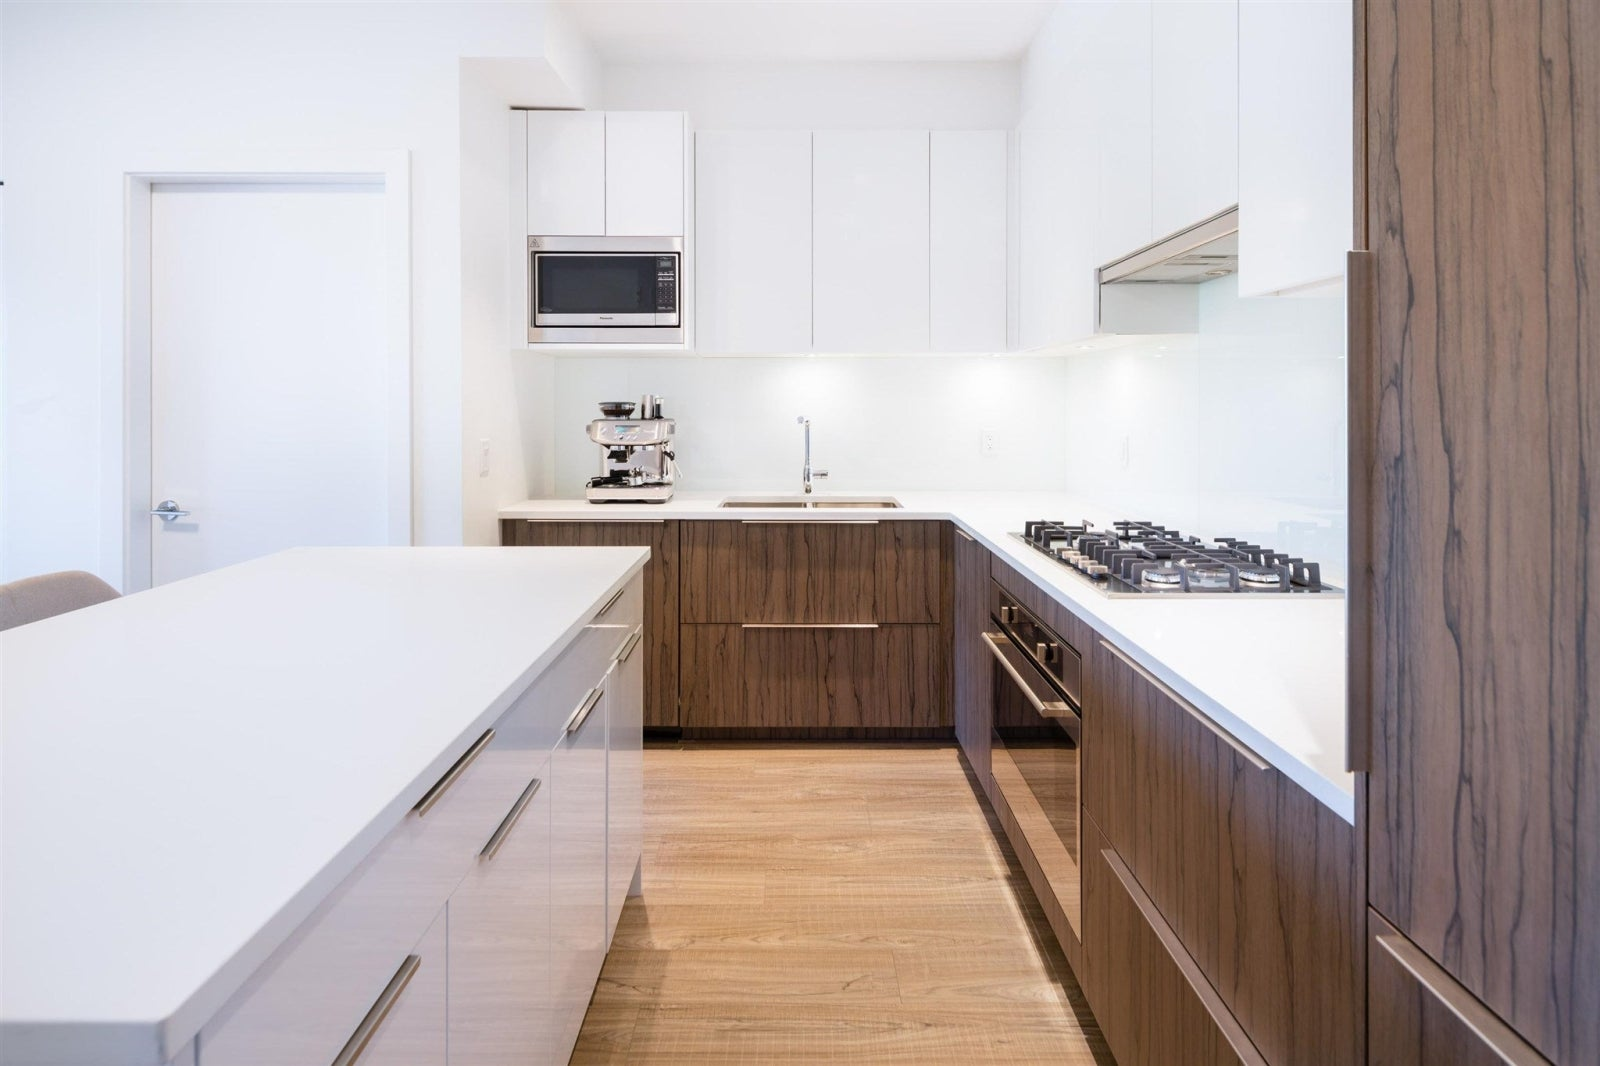 408 379 E BROADWAY AVENUE - Mount Pleasant VE Apartment/Condo for sale, 2 Bedrooms (R2599900) #4